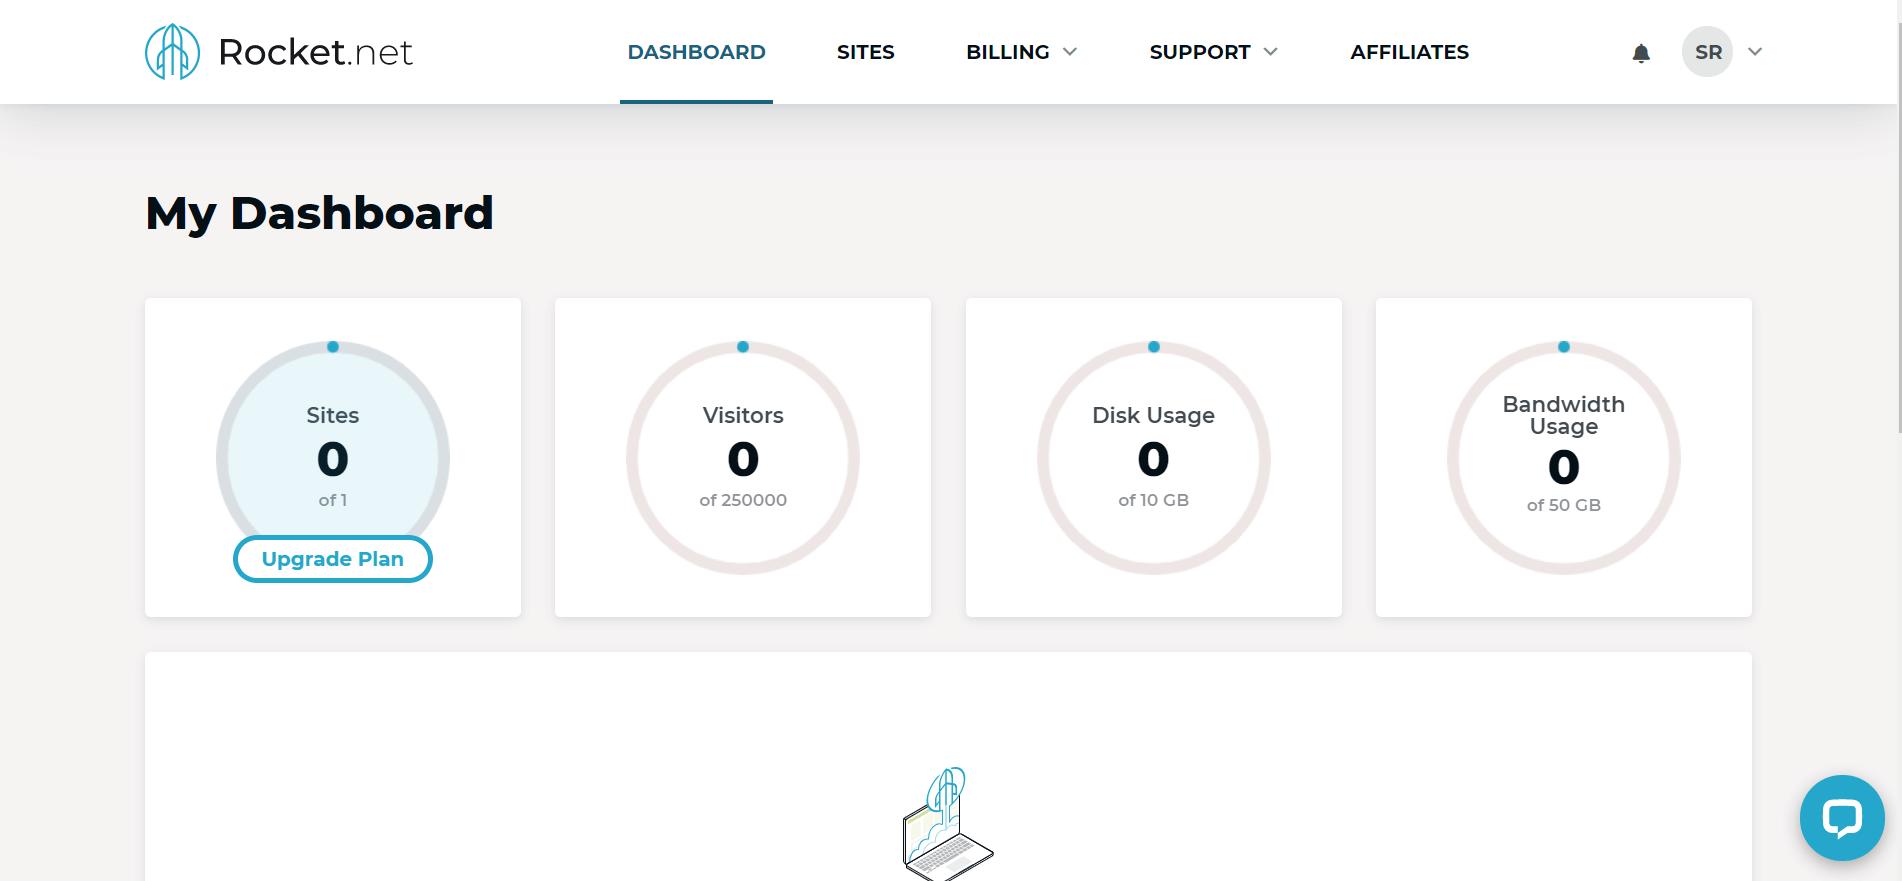 rocket.net client area dashboard